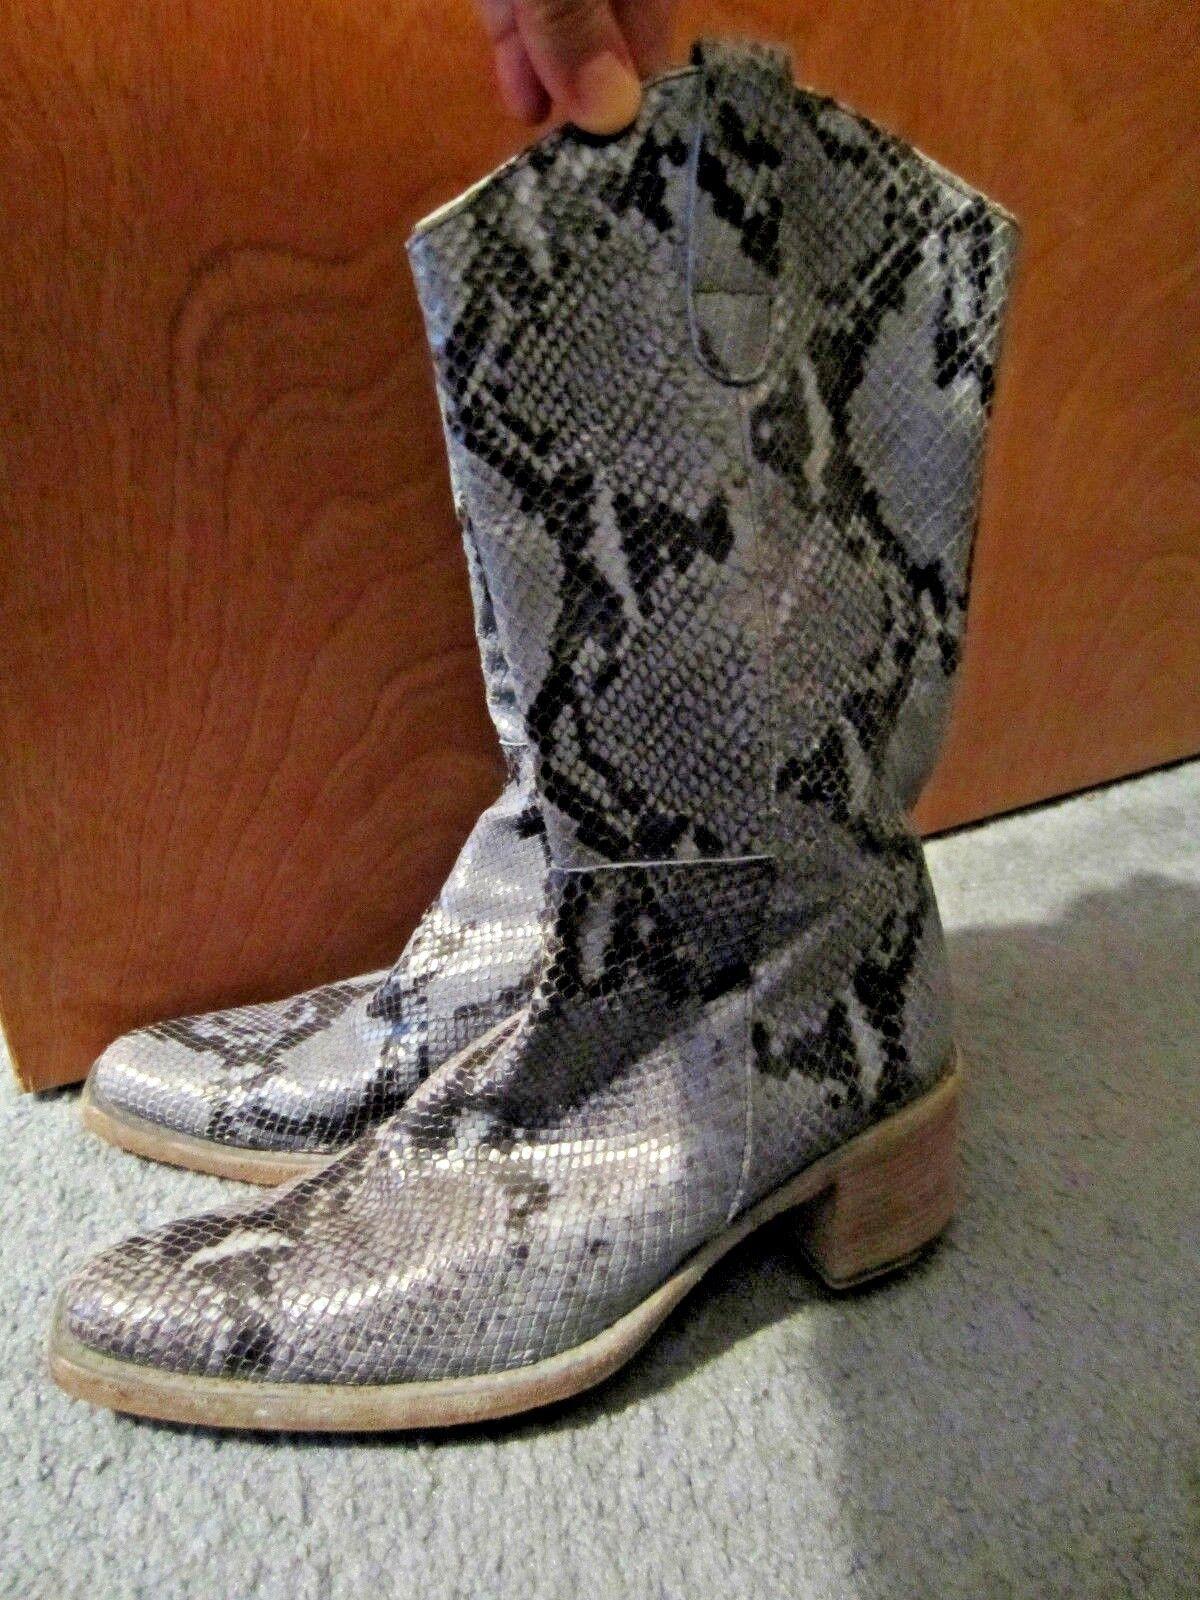 vintage snakeskin mid-calf boots  Blau /schwarz Spain by Hype sz 8 M stacked heel